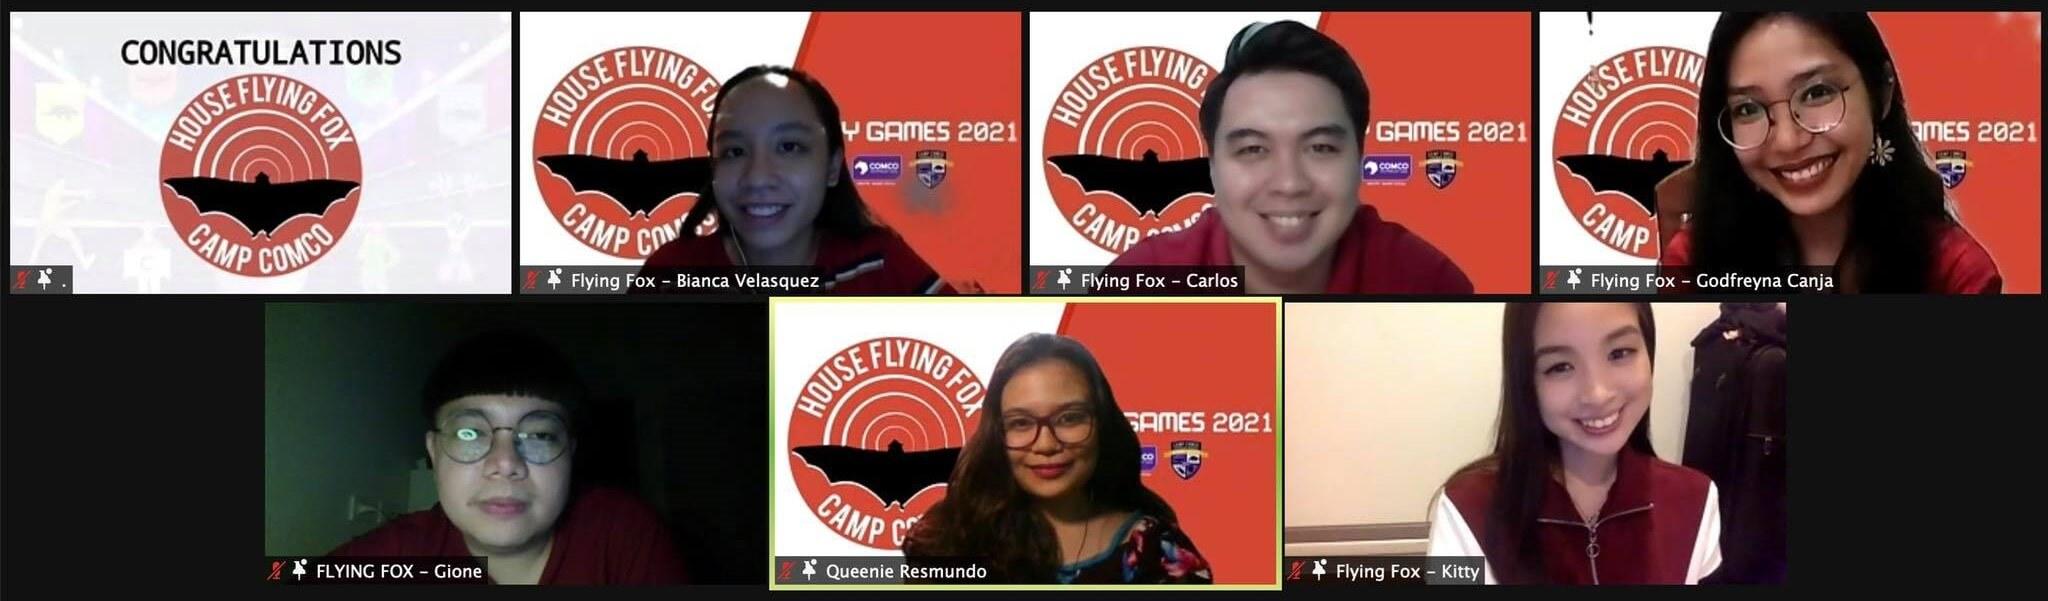 Camp ComCo Unity Games 2021 - House Flyingfox